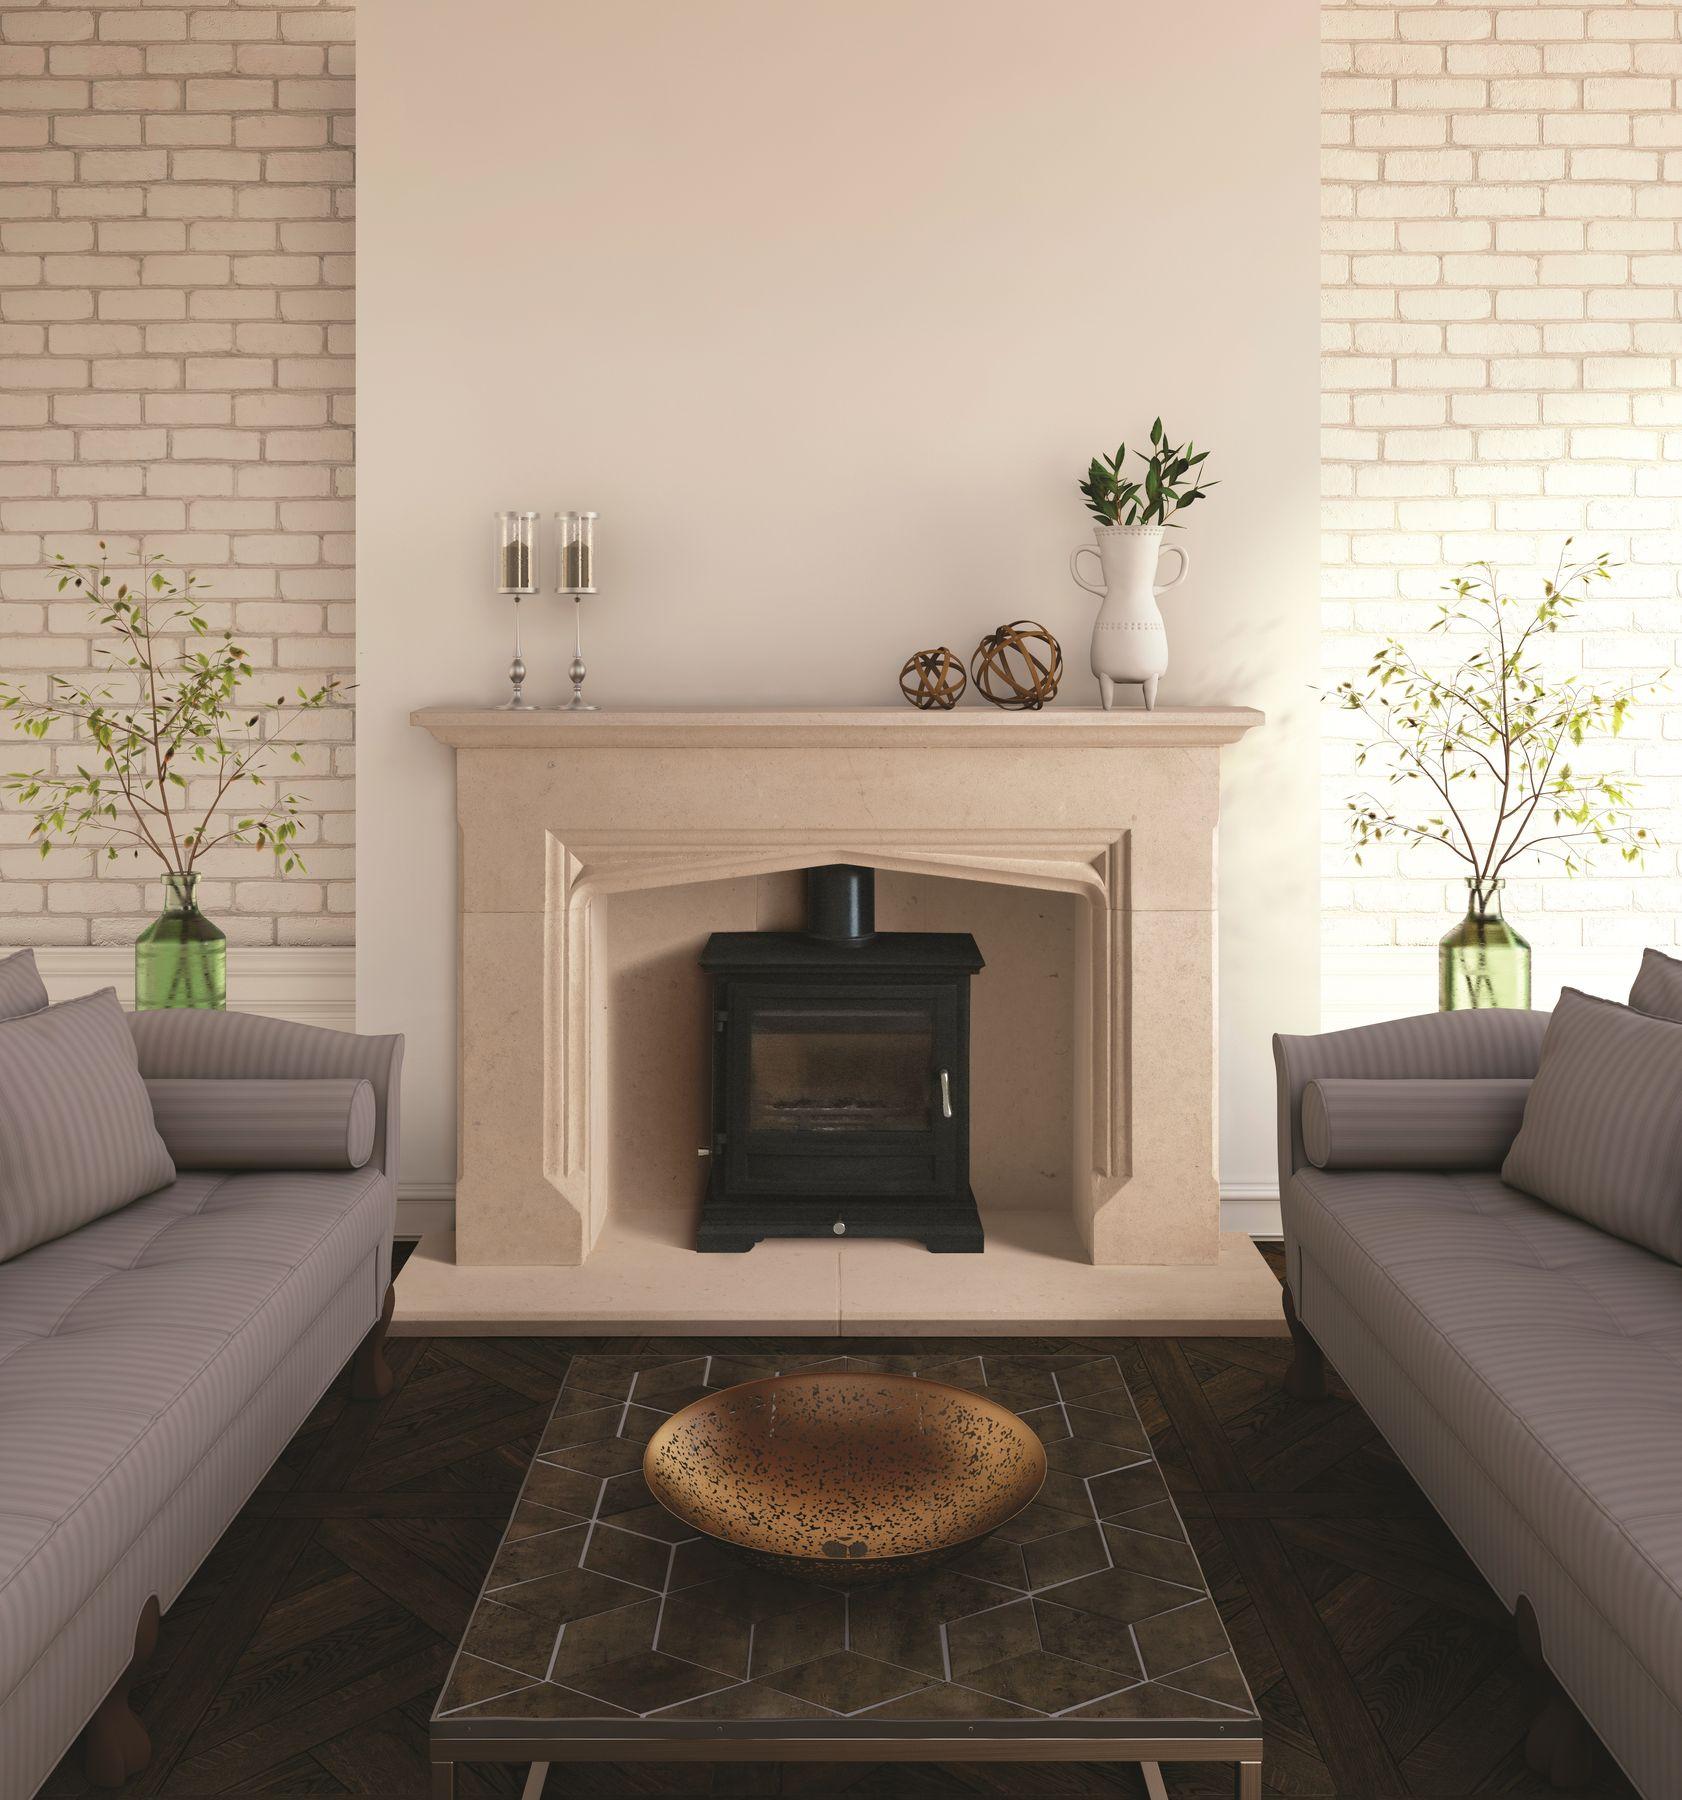 Gotherington Bathstone Fireplace